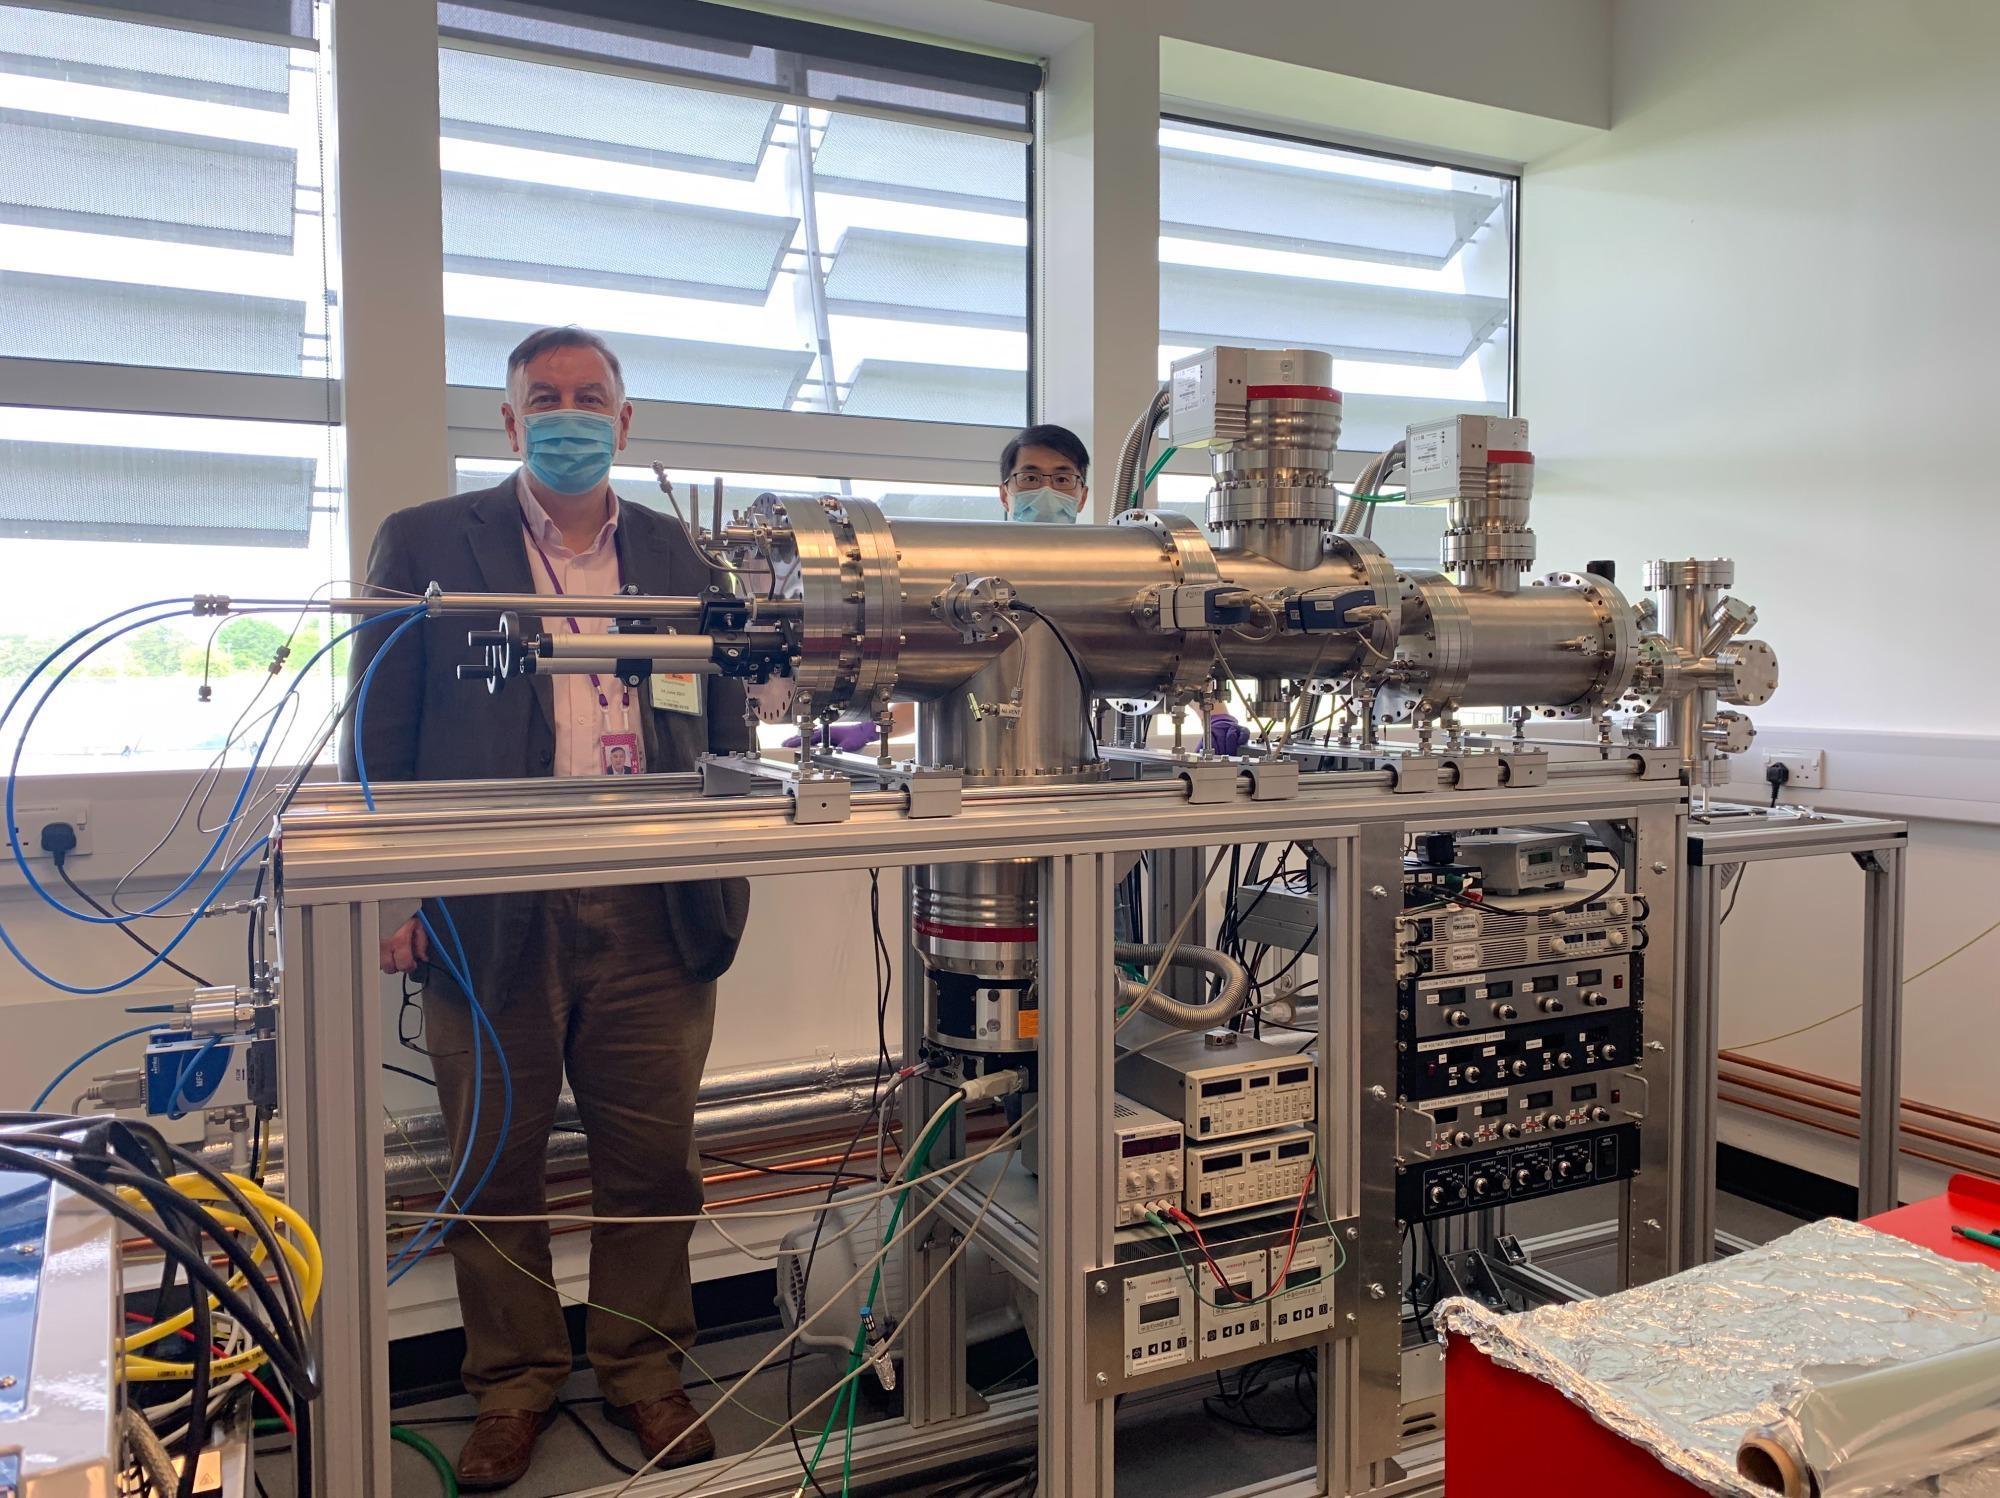 Swansea University and Diamond Light Source to Exploit Revolutionary Nanoparticle Beam Technology